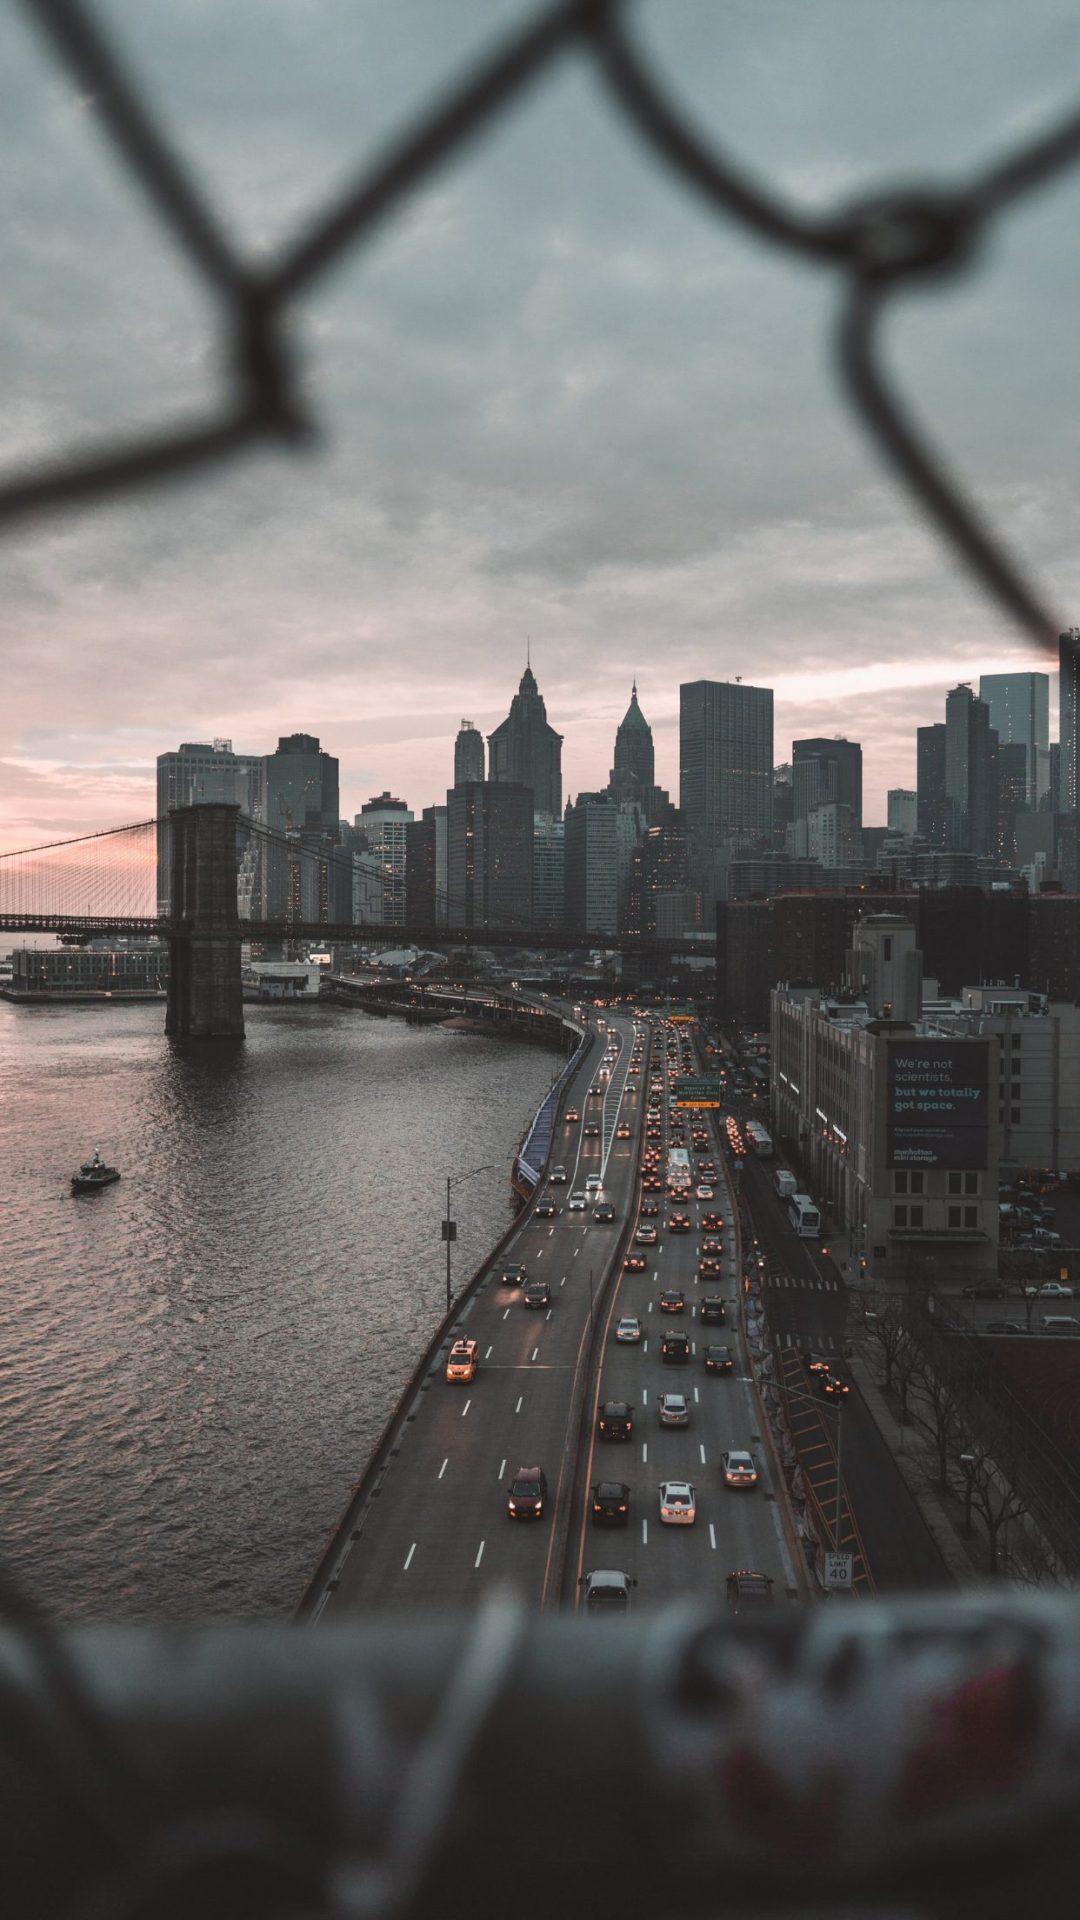 Night time NYC